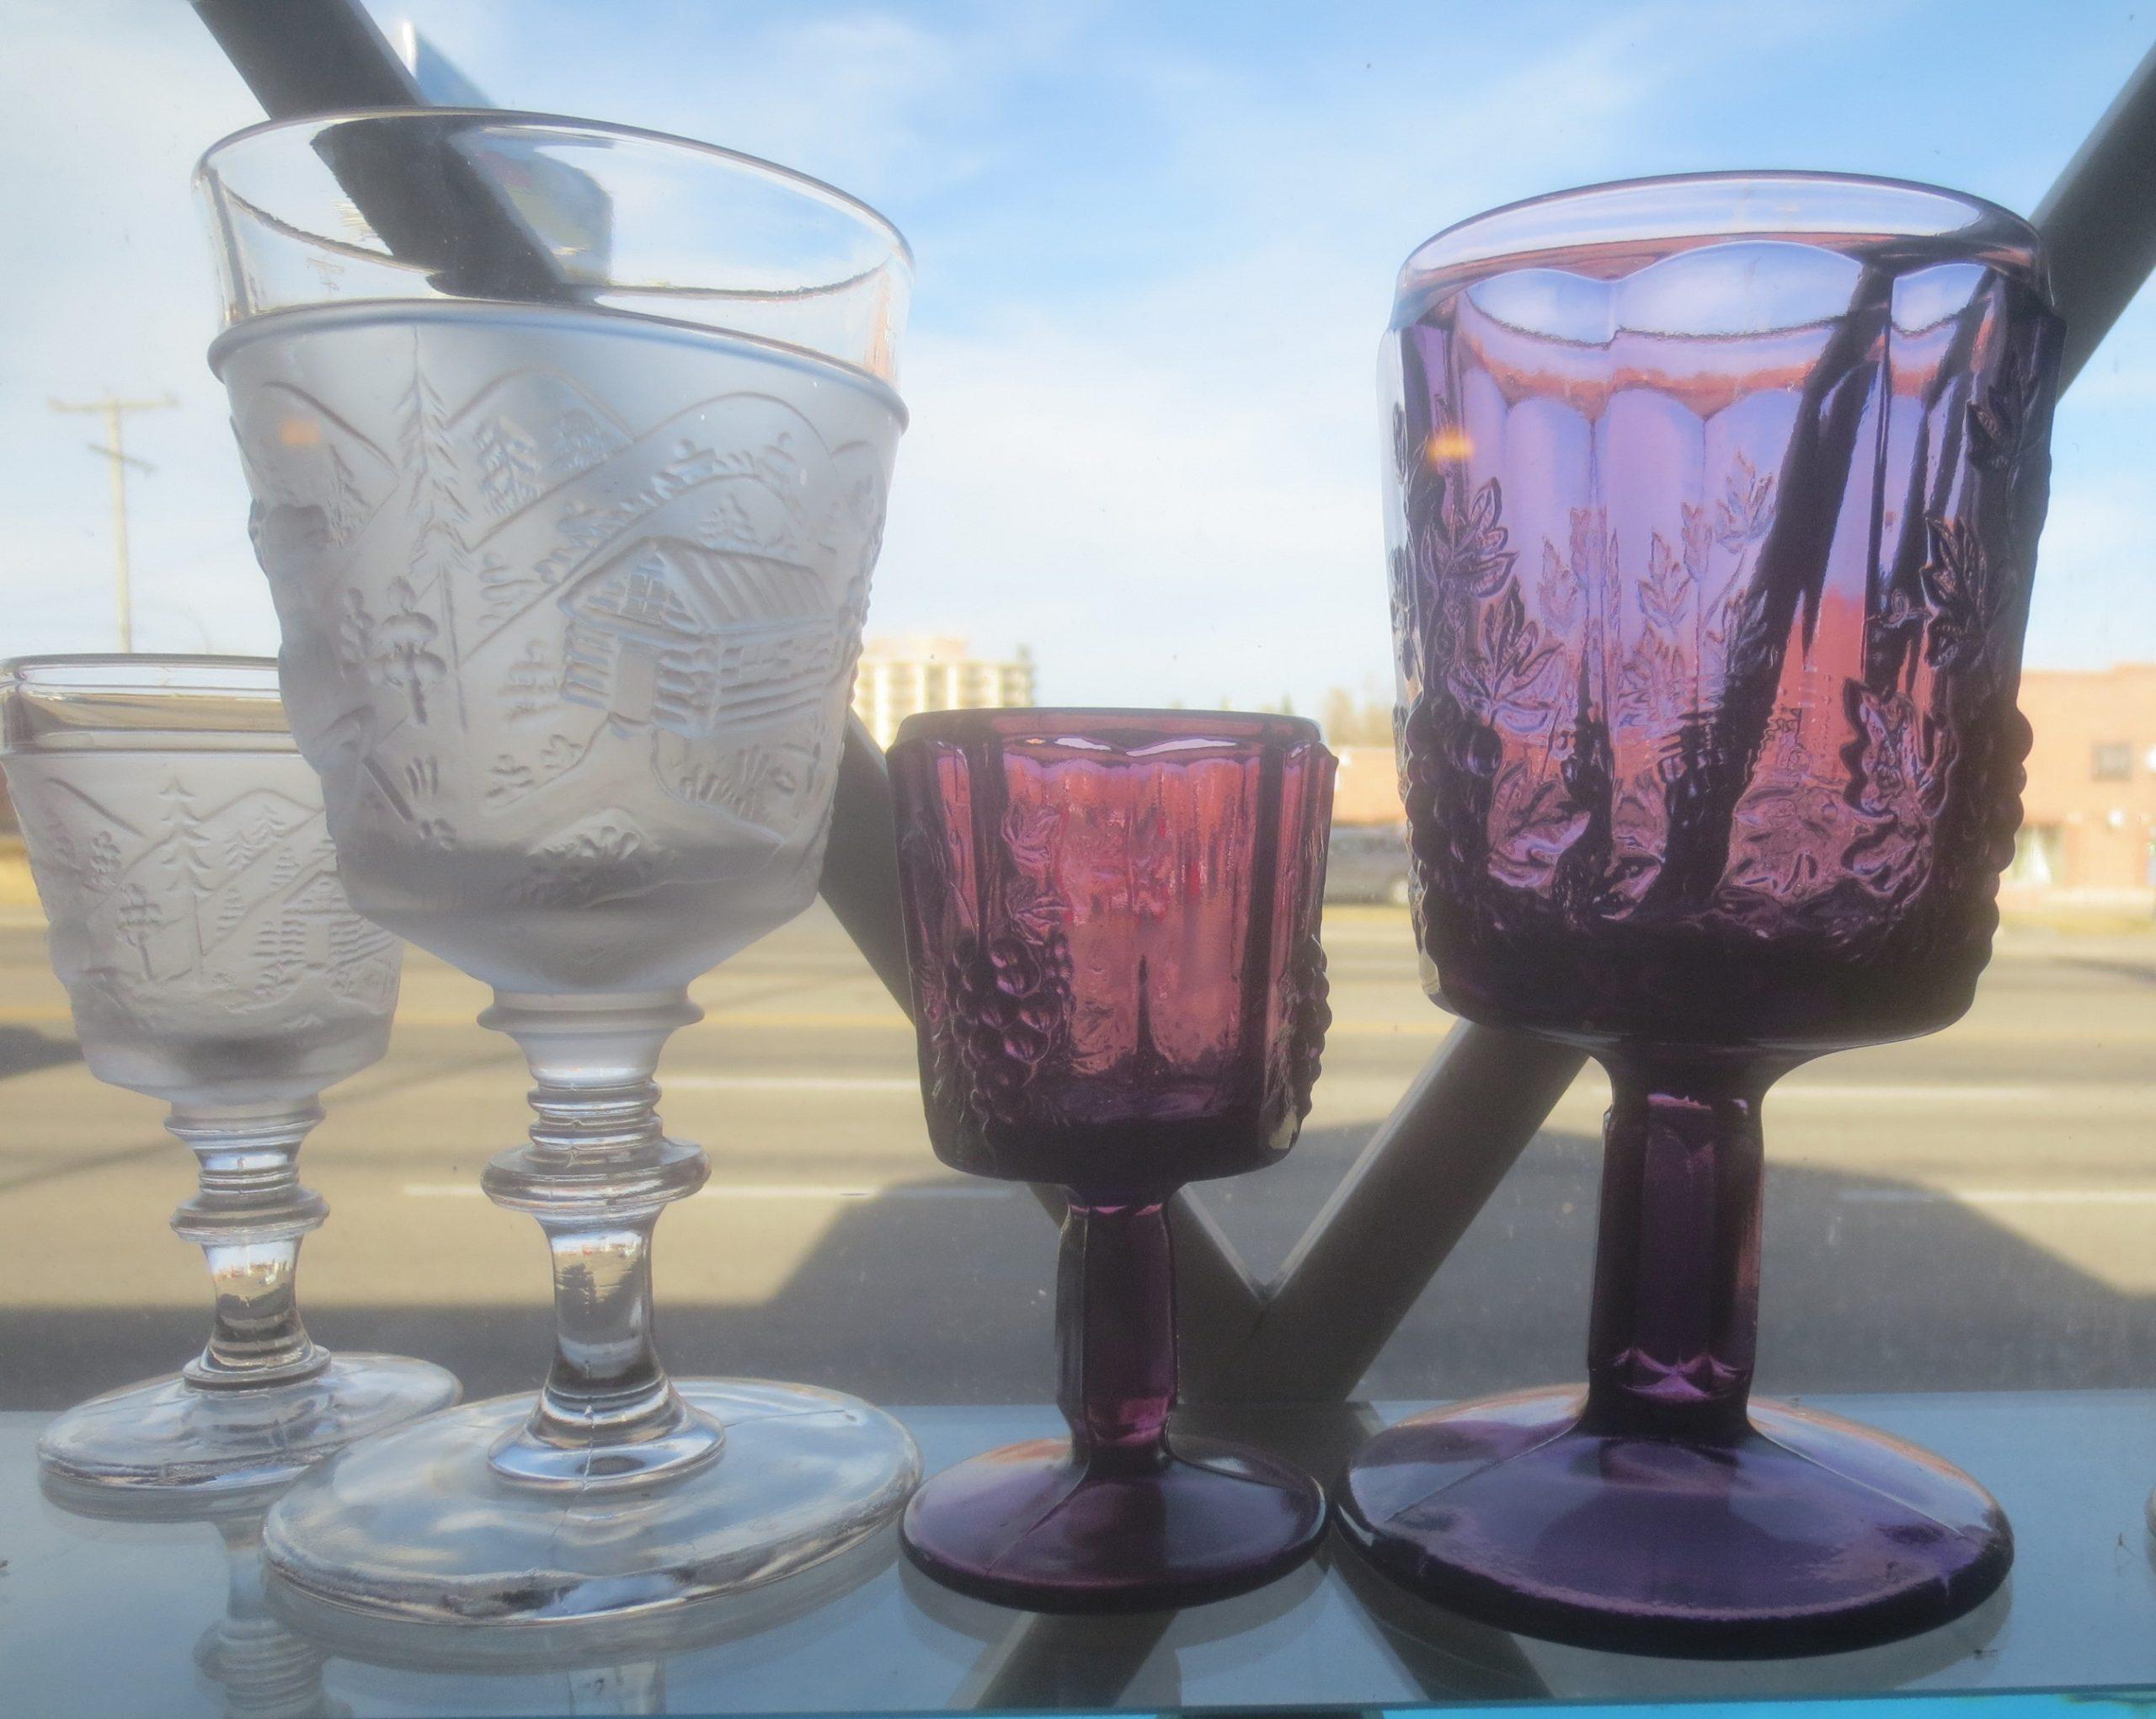 four decorative glasses in a window